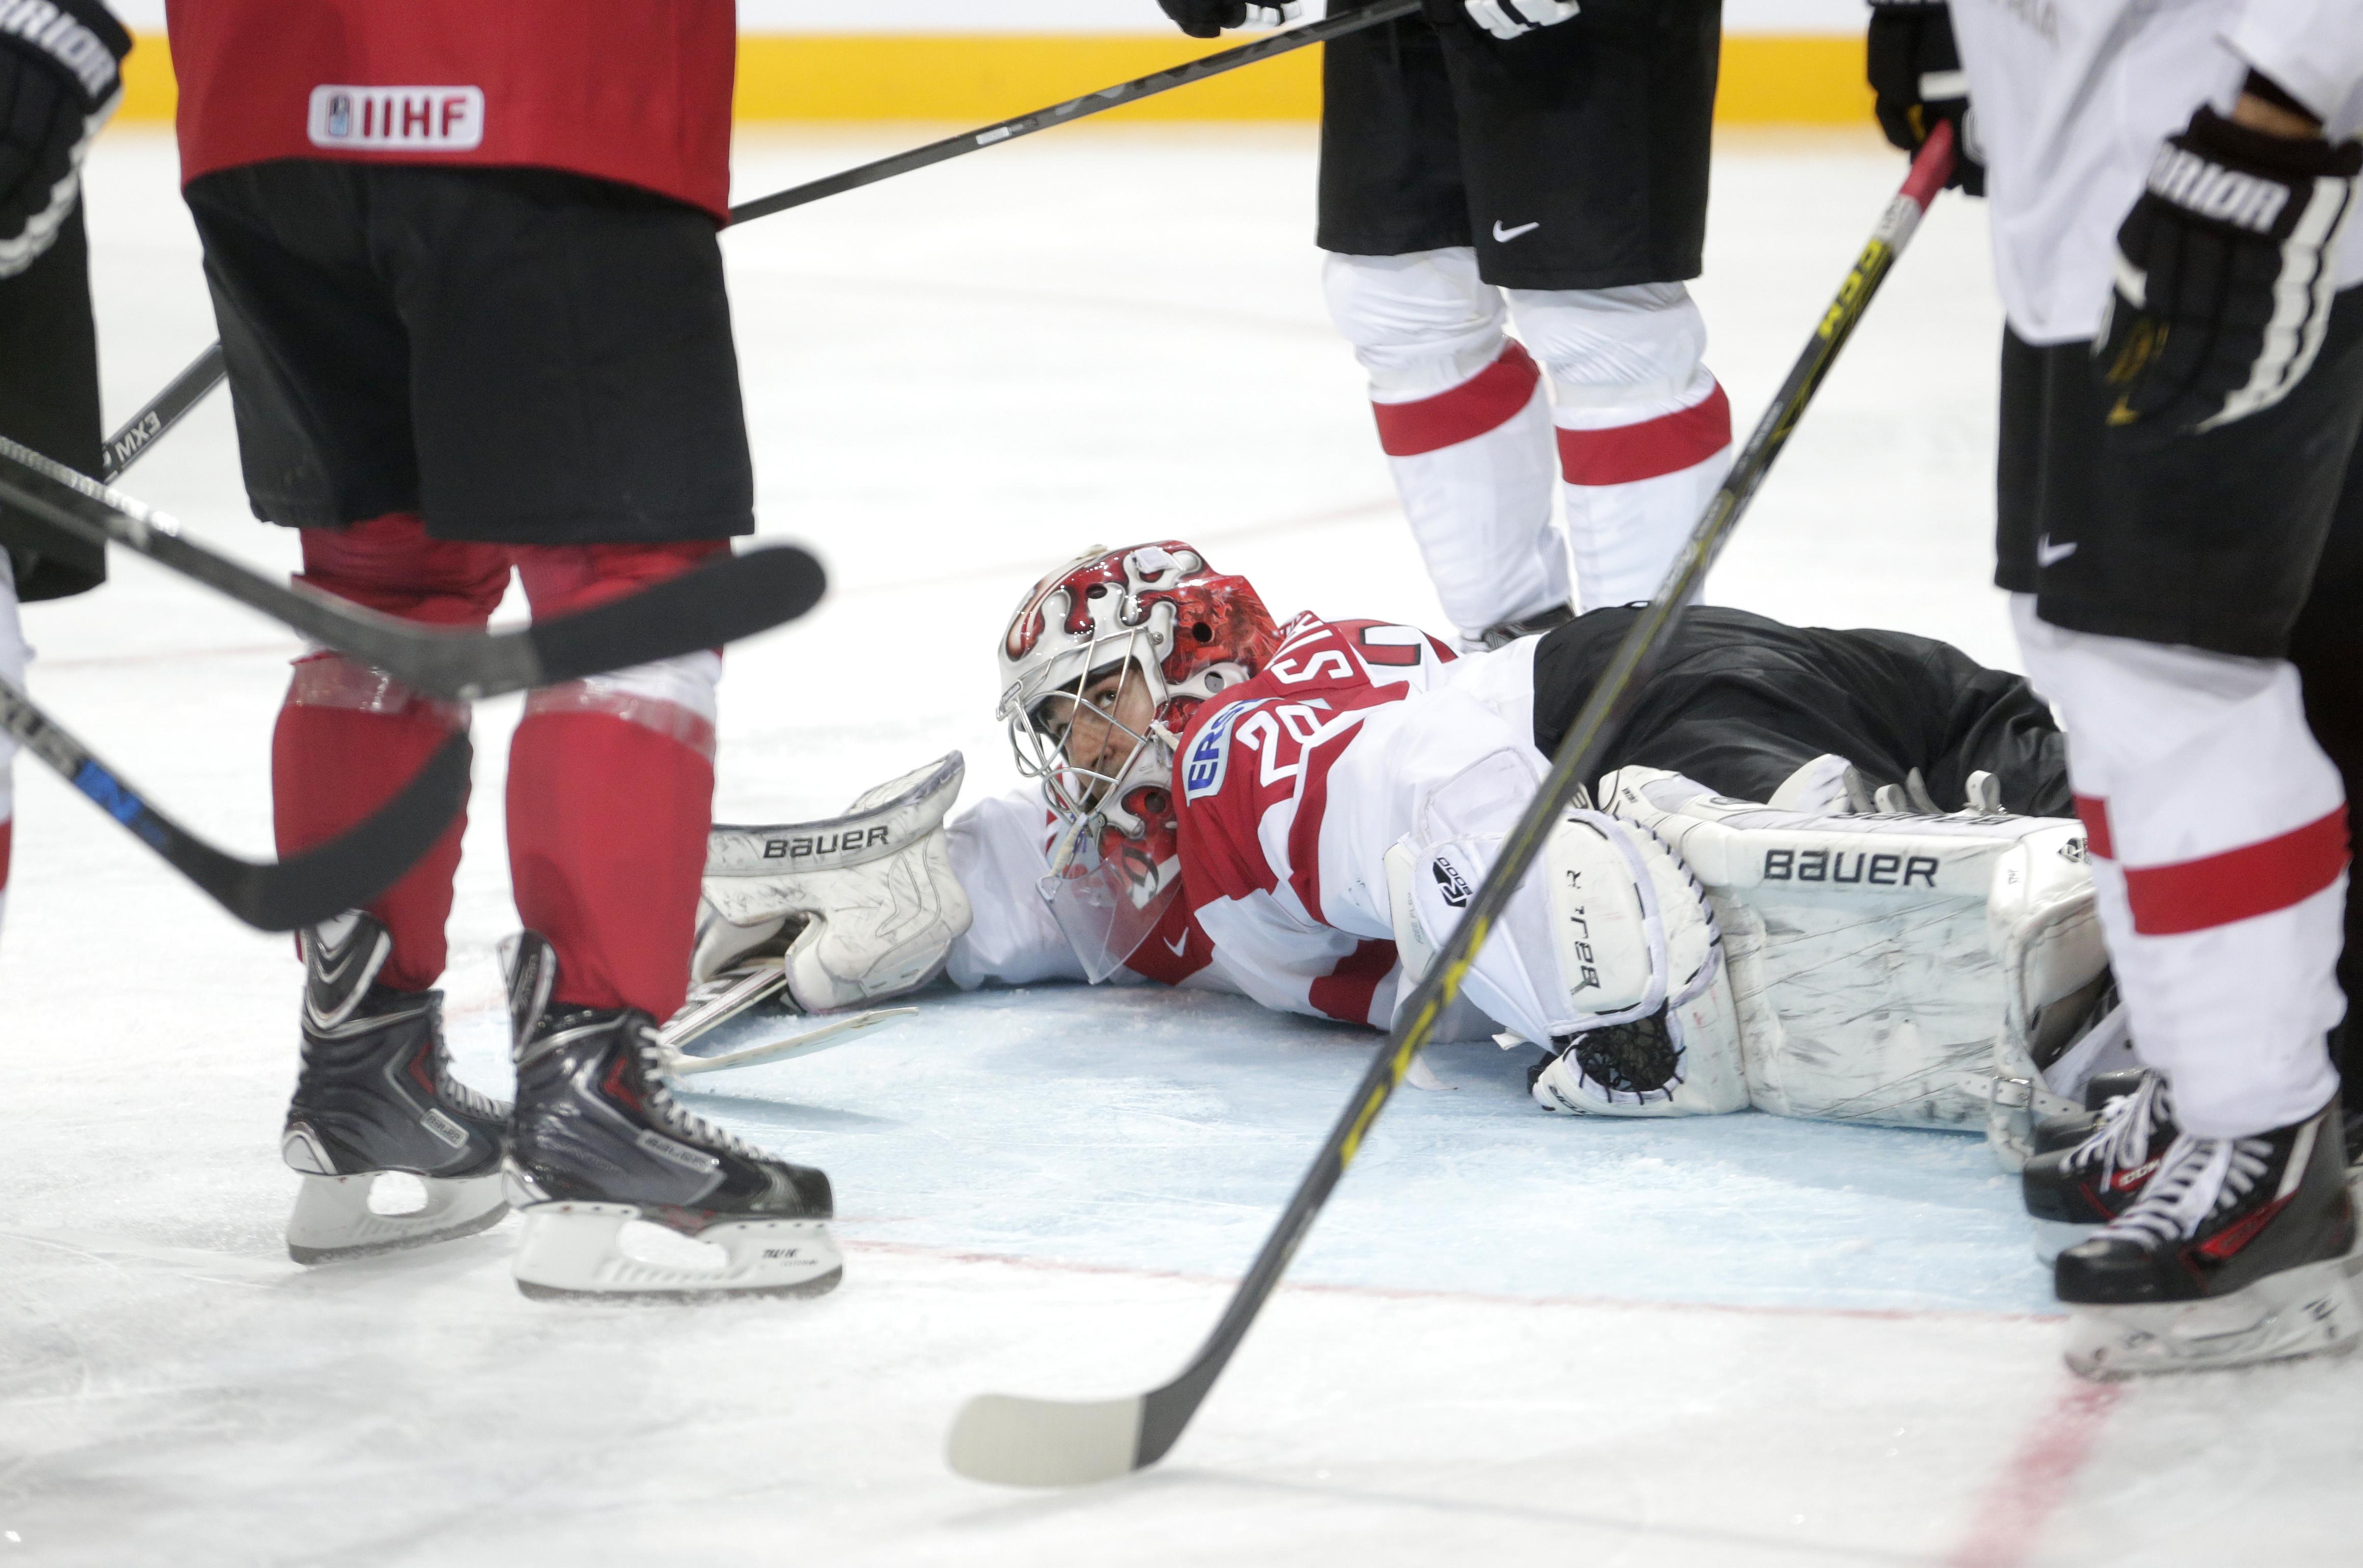 Austria's goalkeeper Bernhard Starkbaum lies on the ice during the Hockey World Championships Group A match against Switzerland in Prague, Czech Republic, Saturday, May 2, 2015. (AP Photo/Petr David Josek)